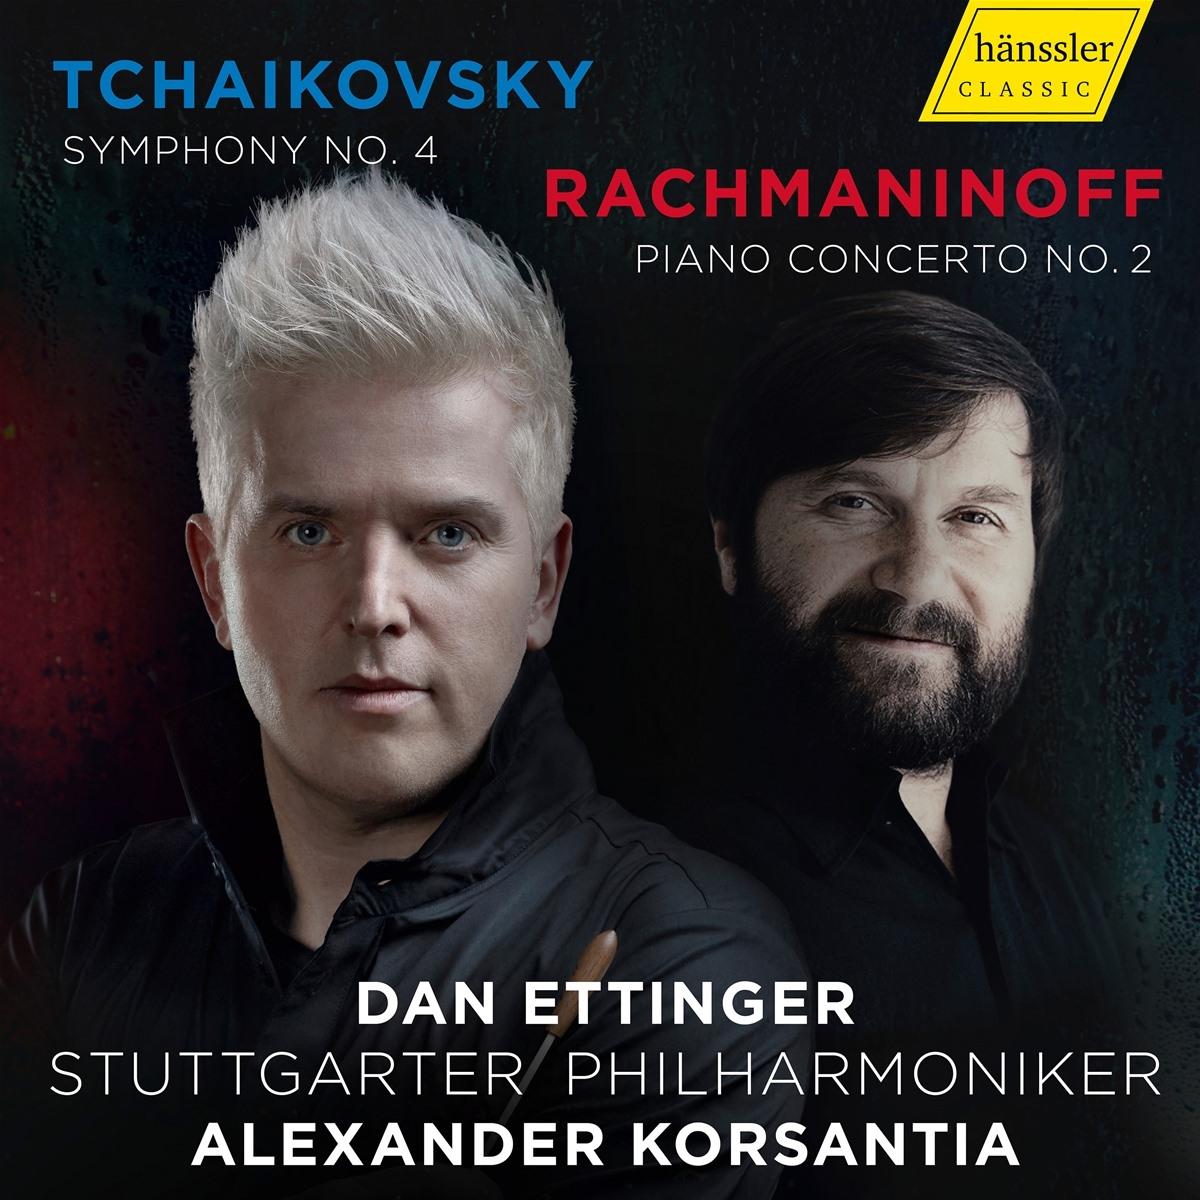 Tchaikovksy Sinfonie 4 & Rachmaninoff Piano C